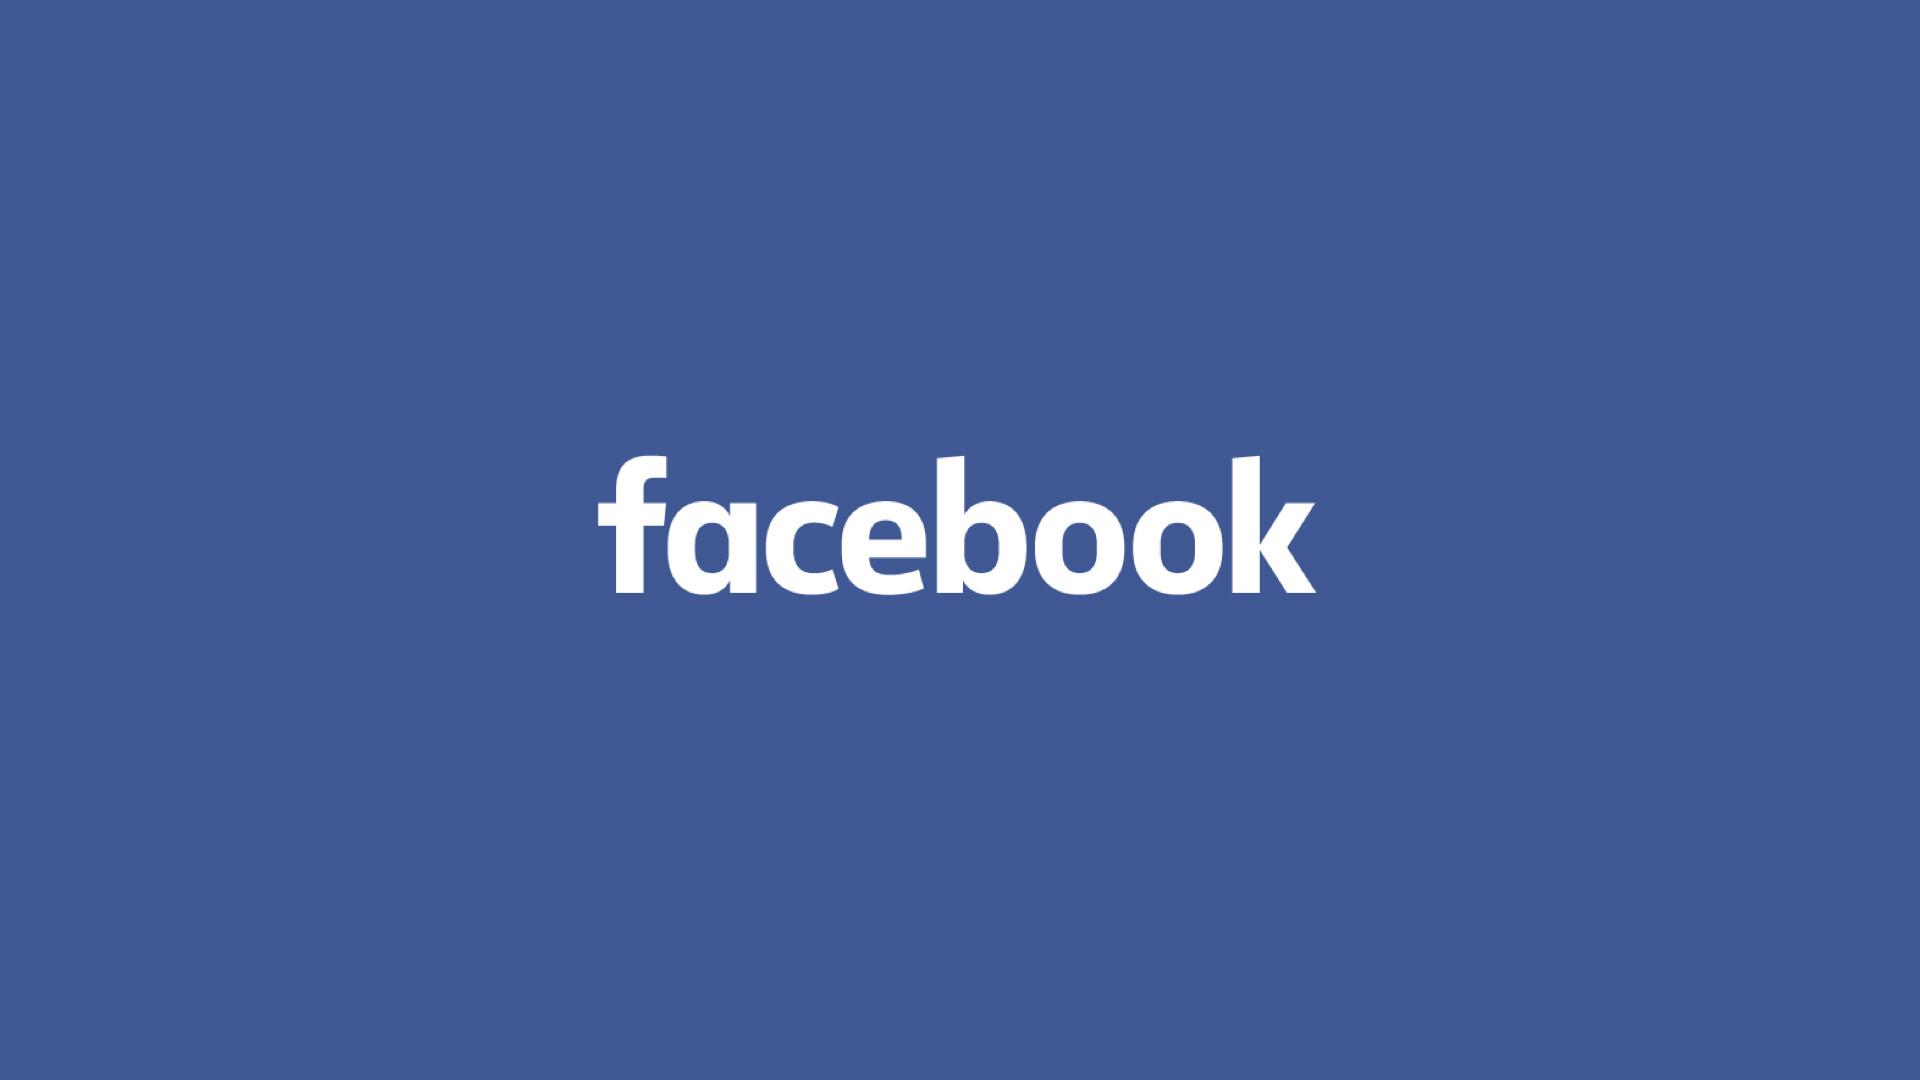 Facebook Kebobolan Untuk Kedua Kalinya | Pemmzchannel